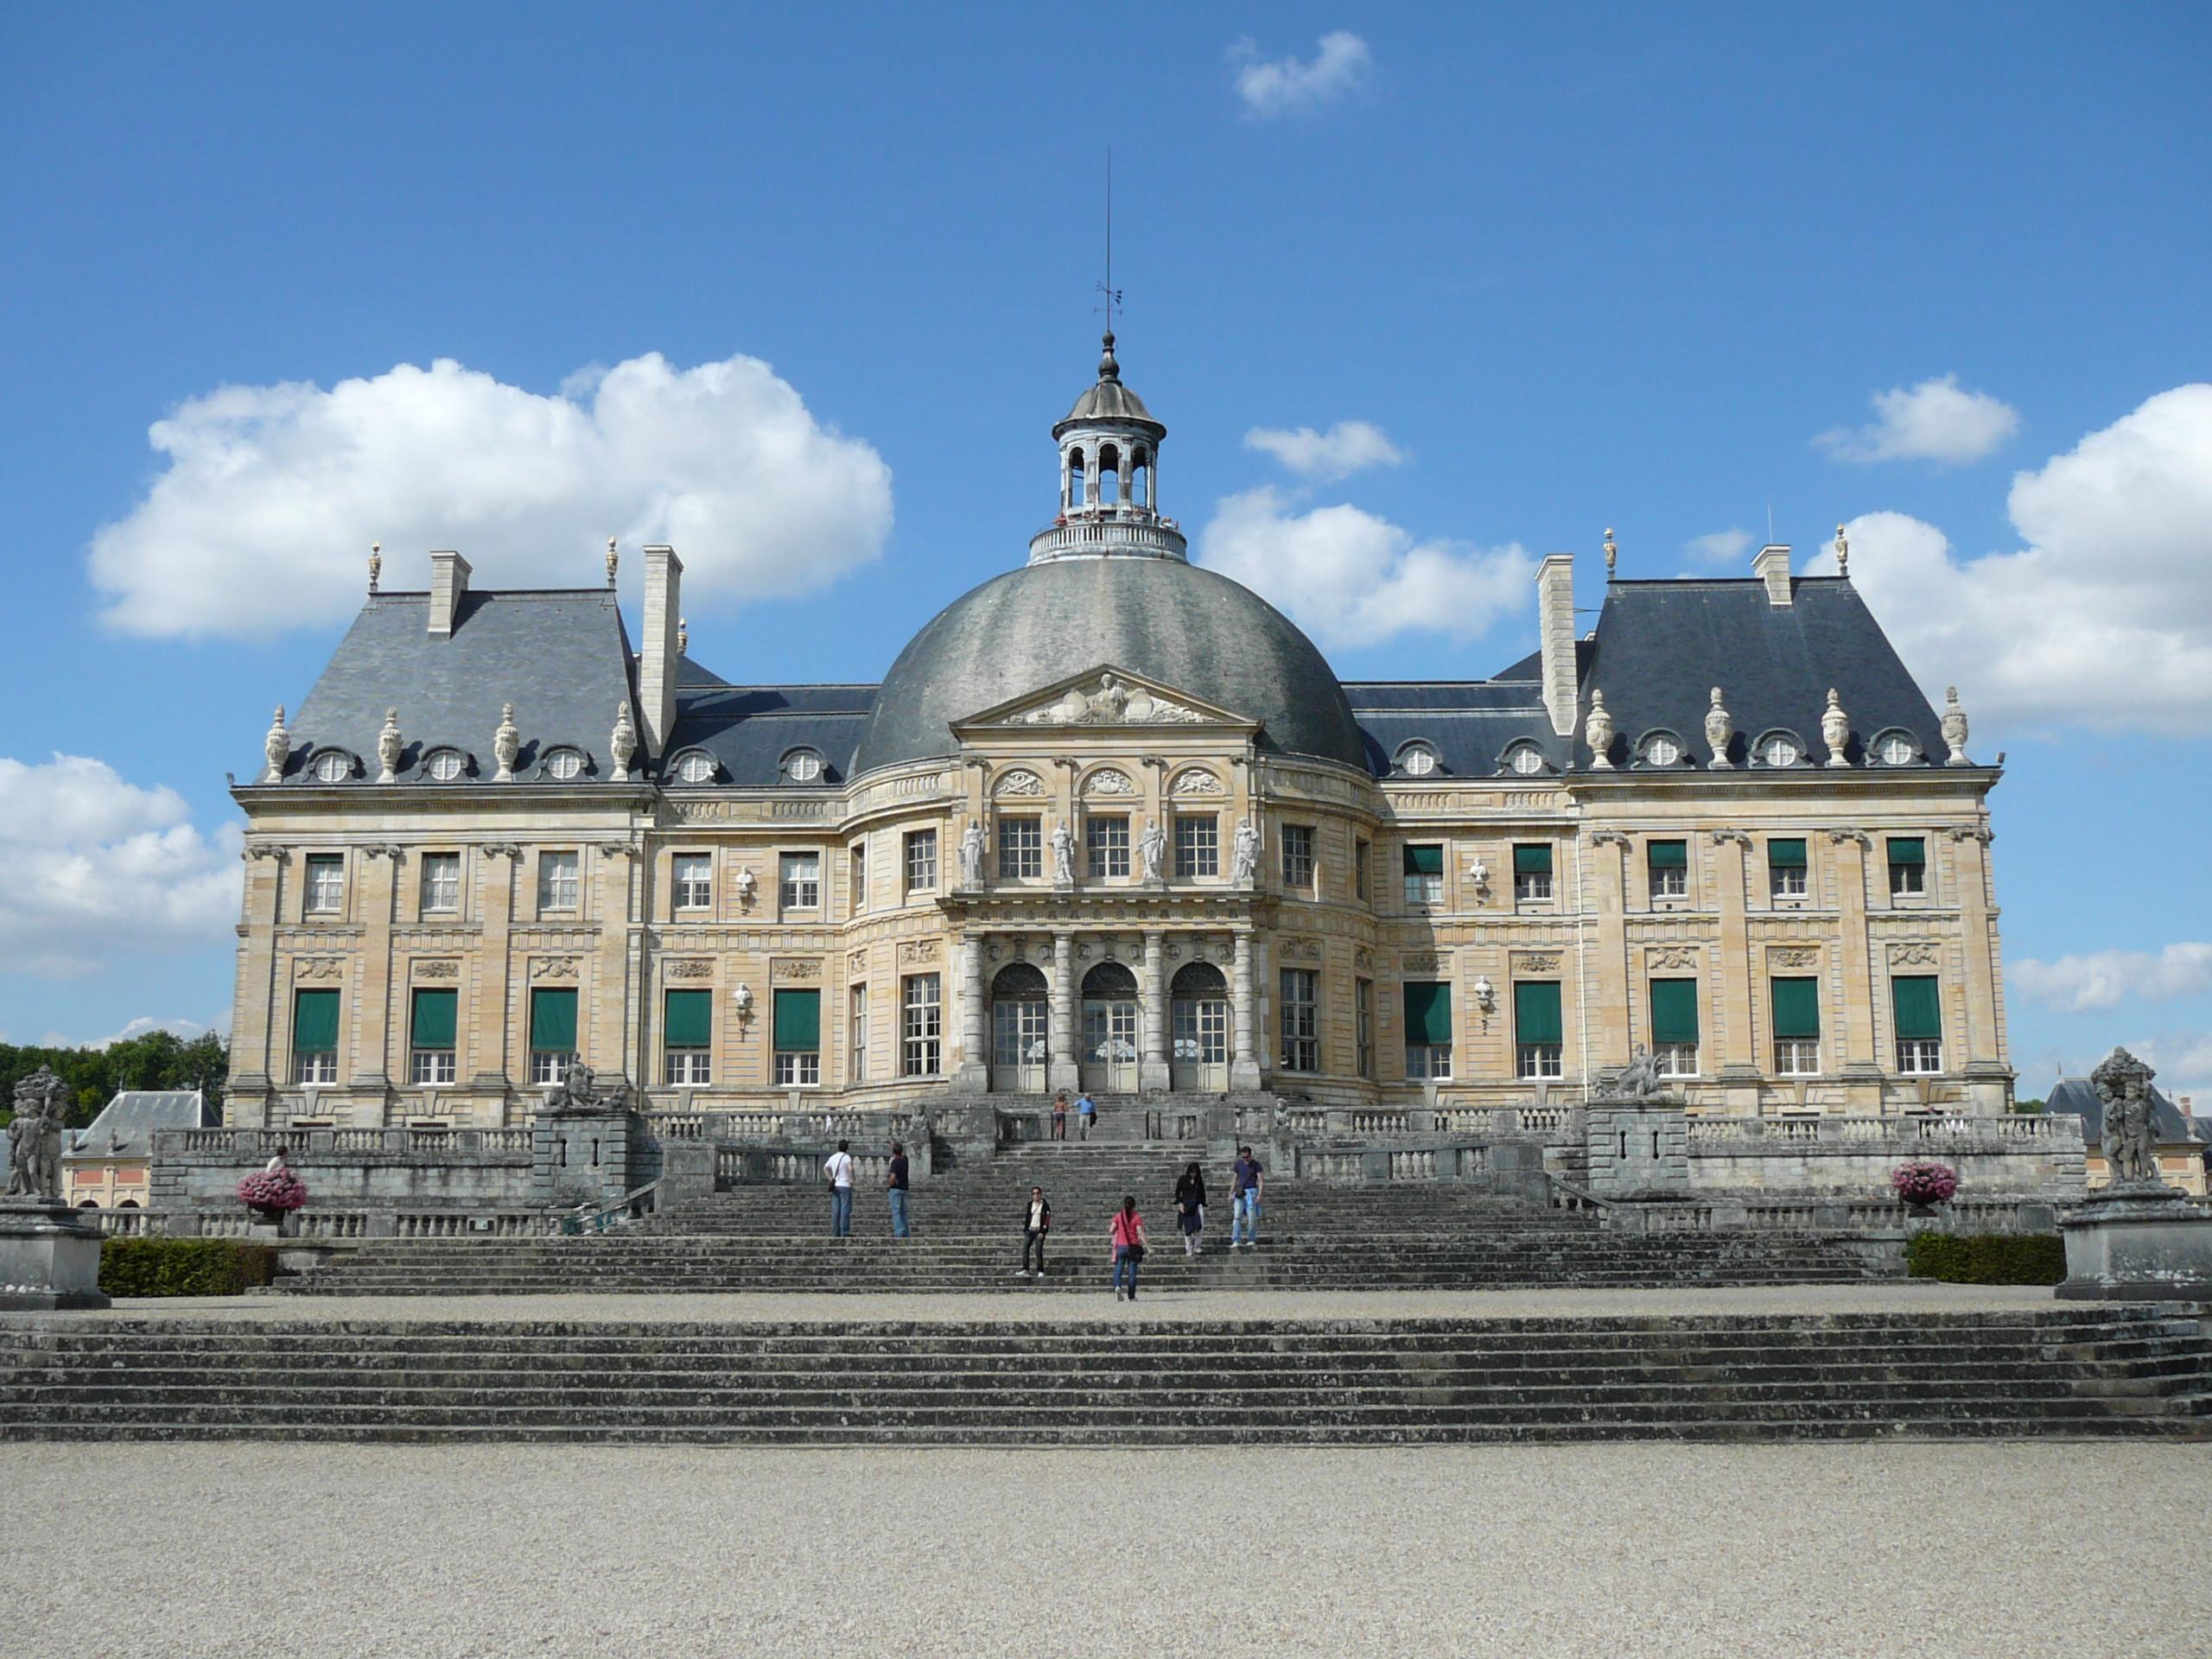 Достопримечательности вокруг Парижа - Замок Vaux le Vicomte